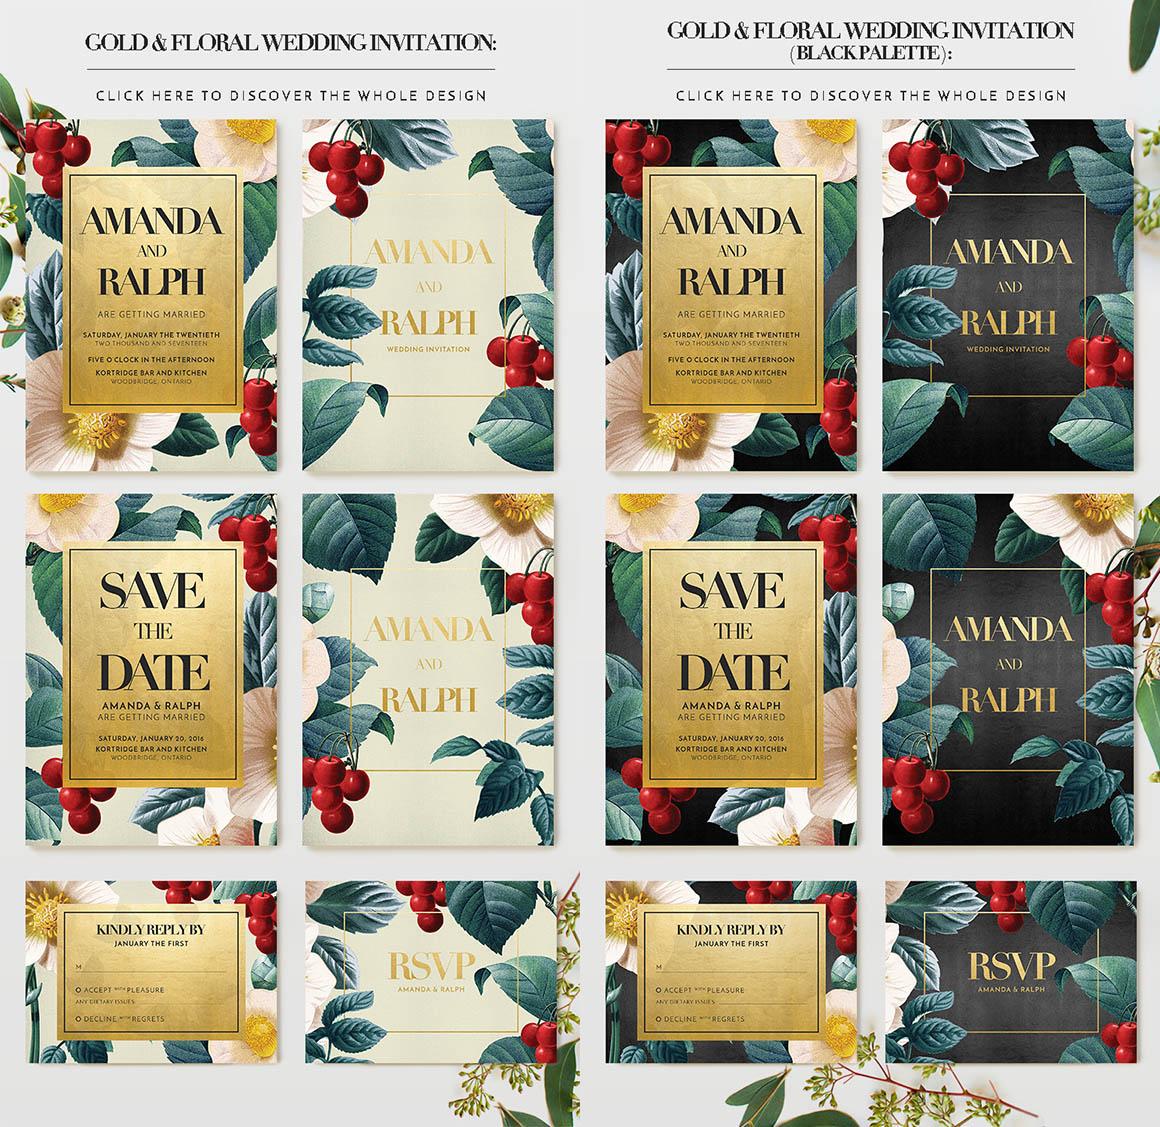 gold-floral-wedding-invitation-5